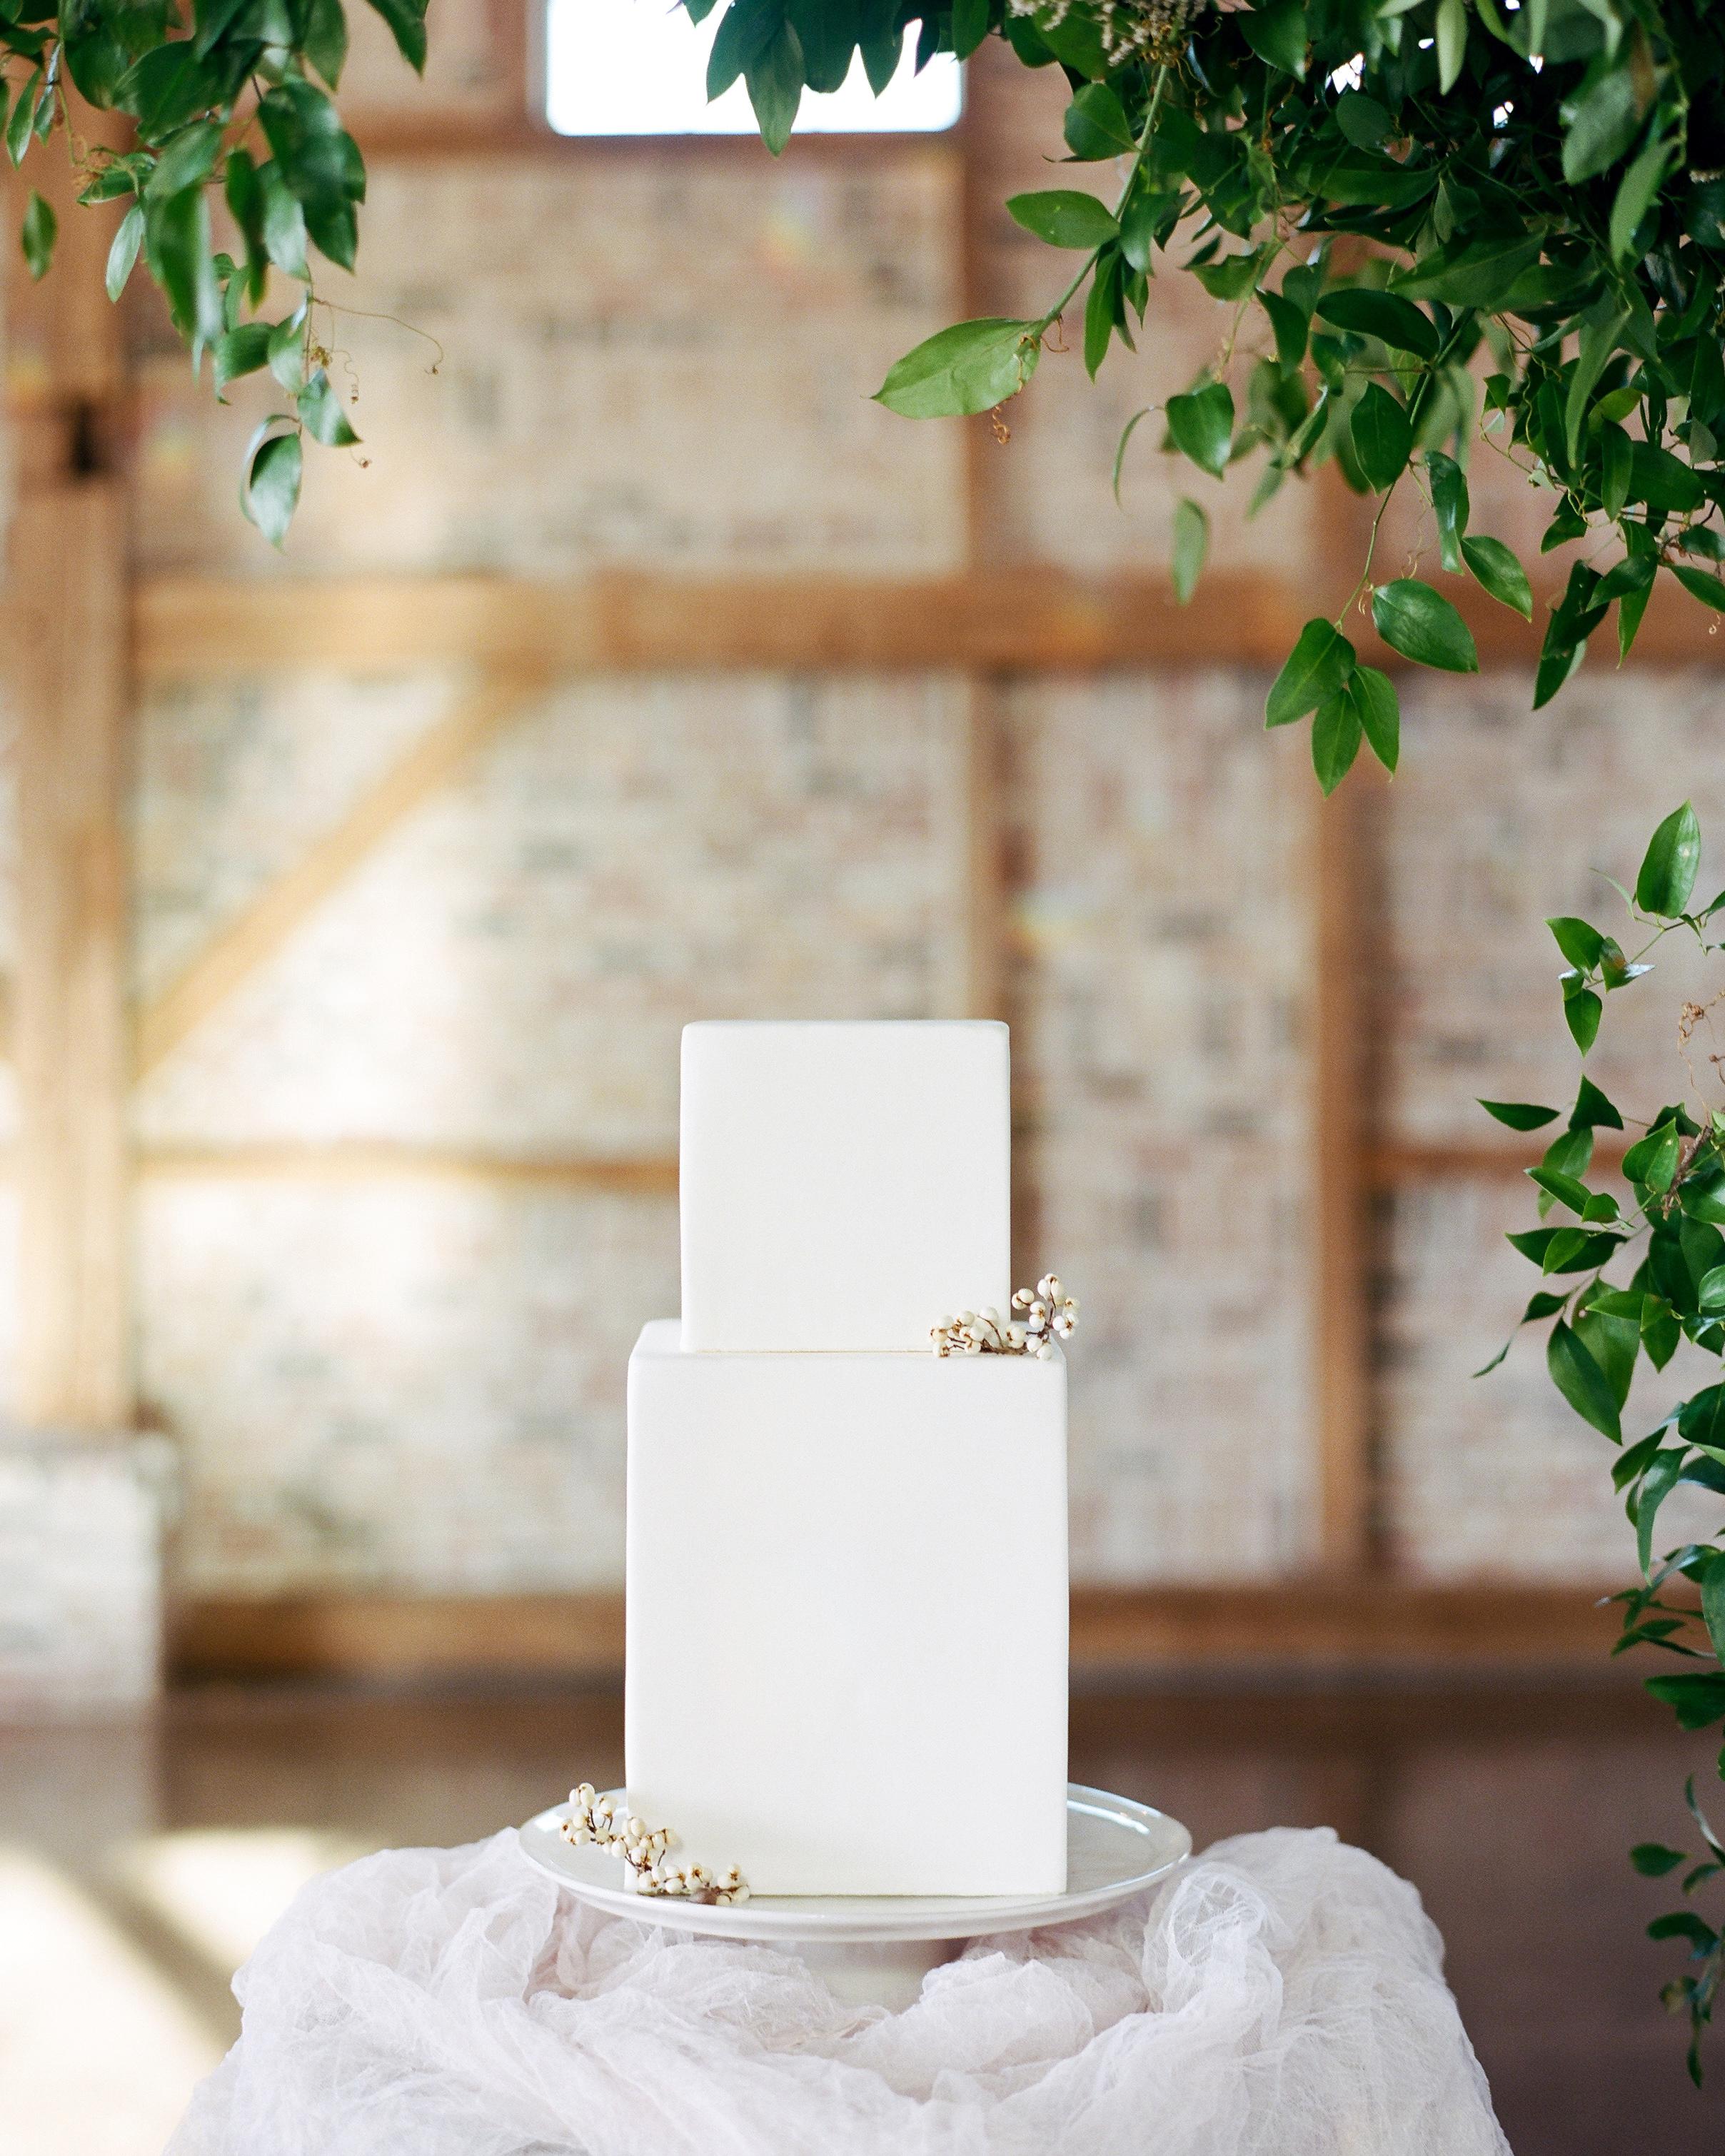 cubed wedding simple rectangular white cake